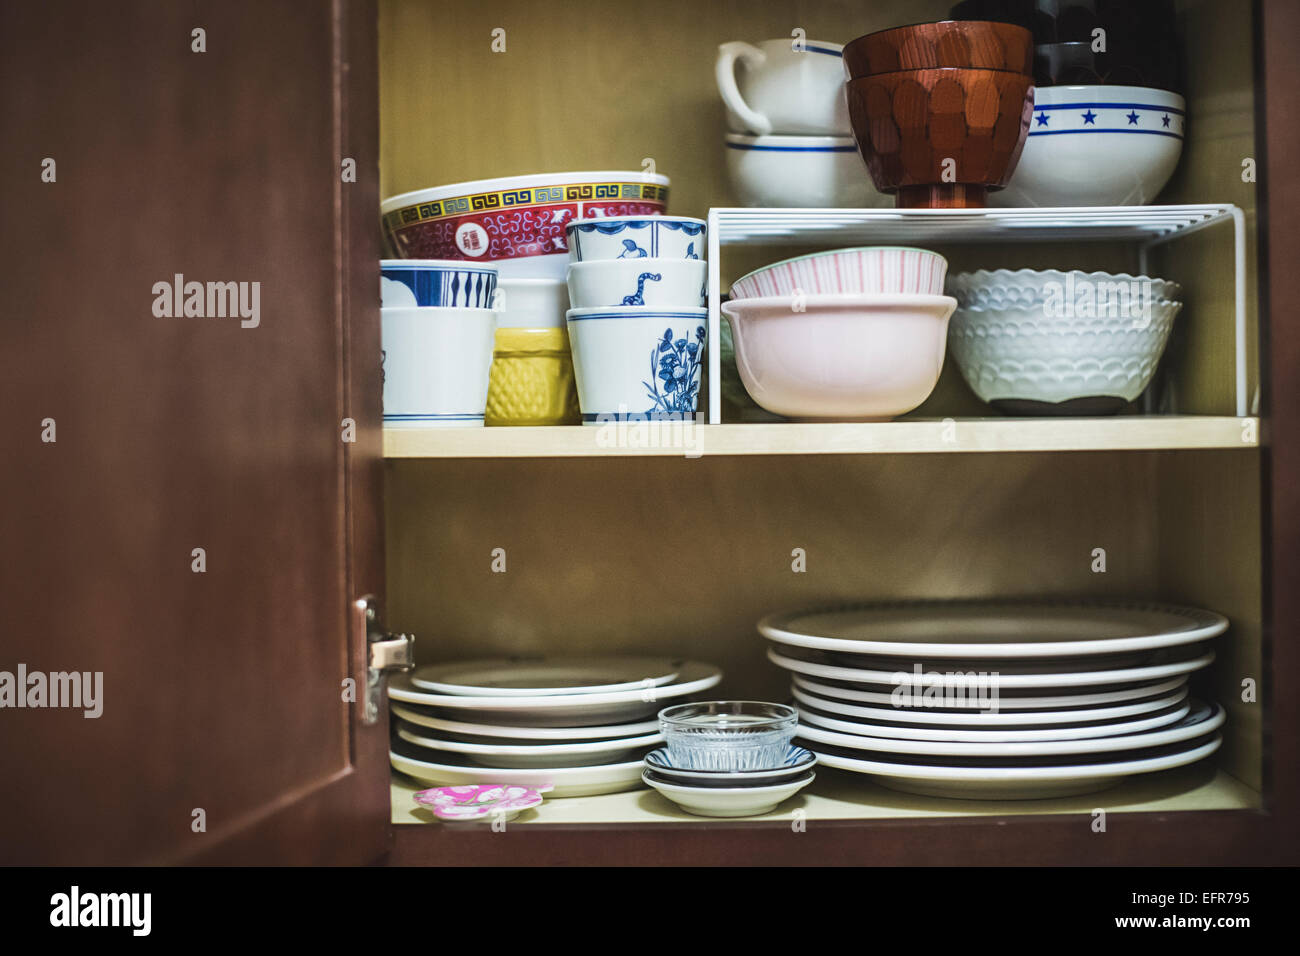 Open cupboard displaying crockery - Stock Image